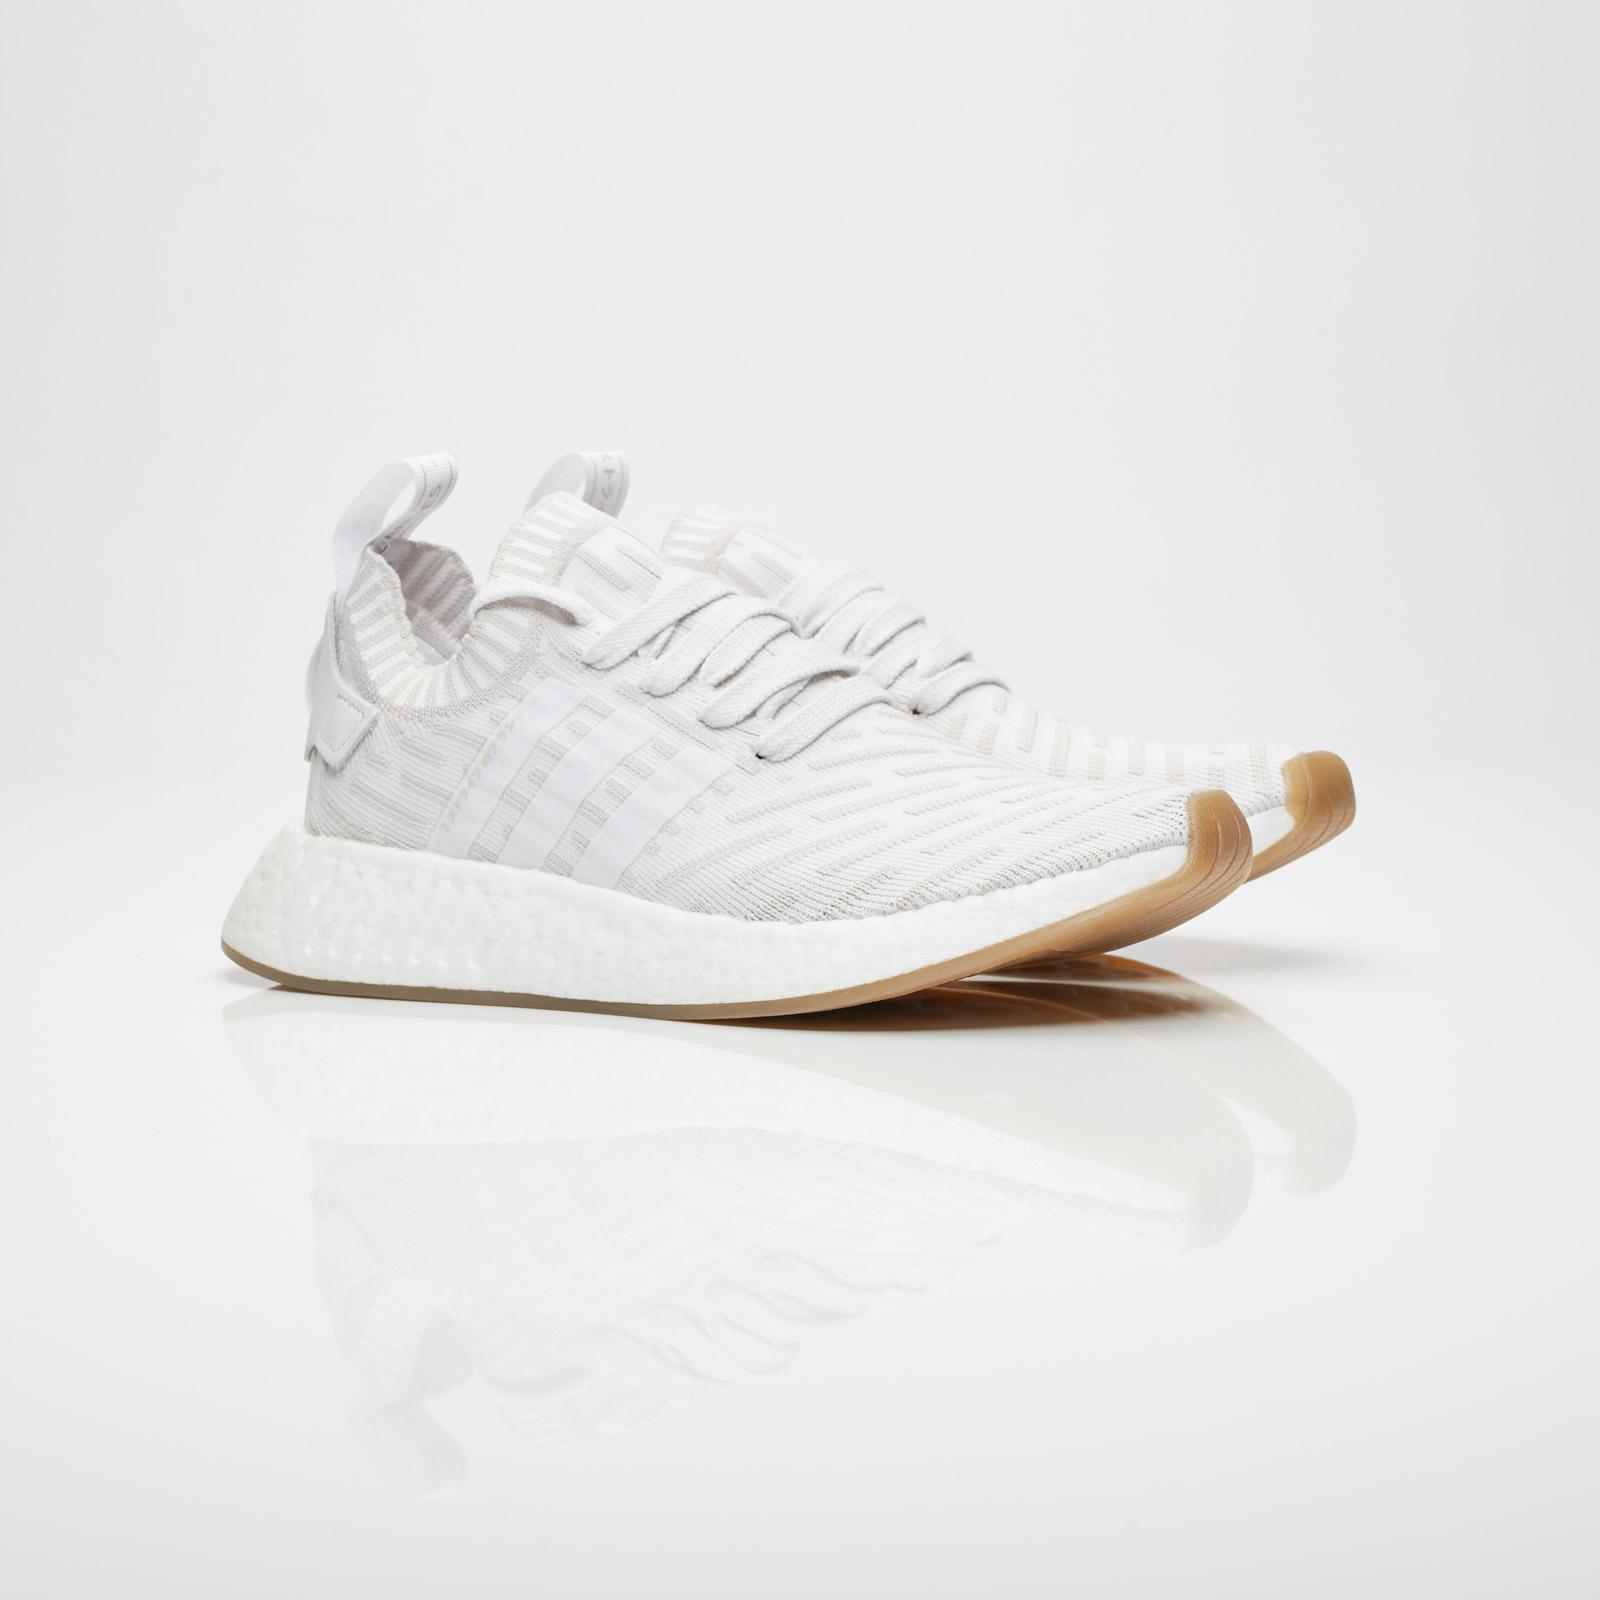 Adidas Nmd R2 Pk W By9954 Sneakersnstuff Sneakers